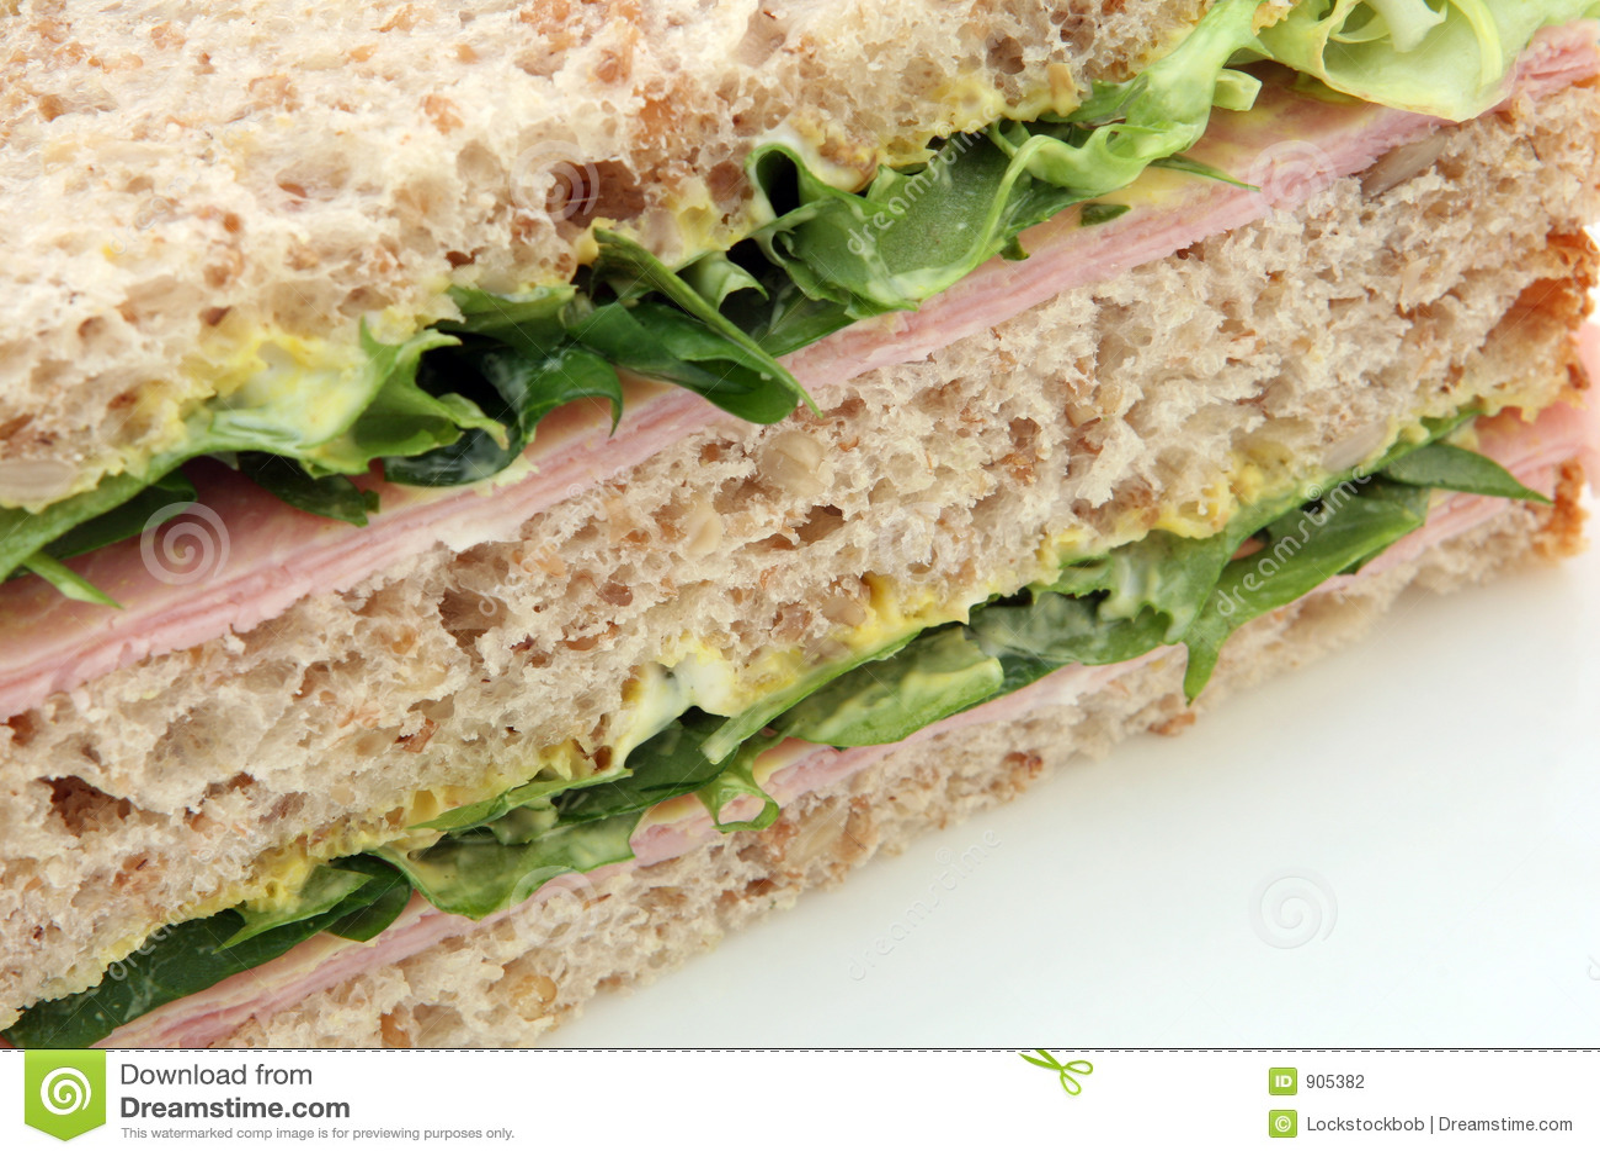 Healthy Egg Ham Mustard And Mayonnaise Brown Bread Watermelon Wallpaper Rainbow Find Free HD for Desktop [freshlhys.tk]